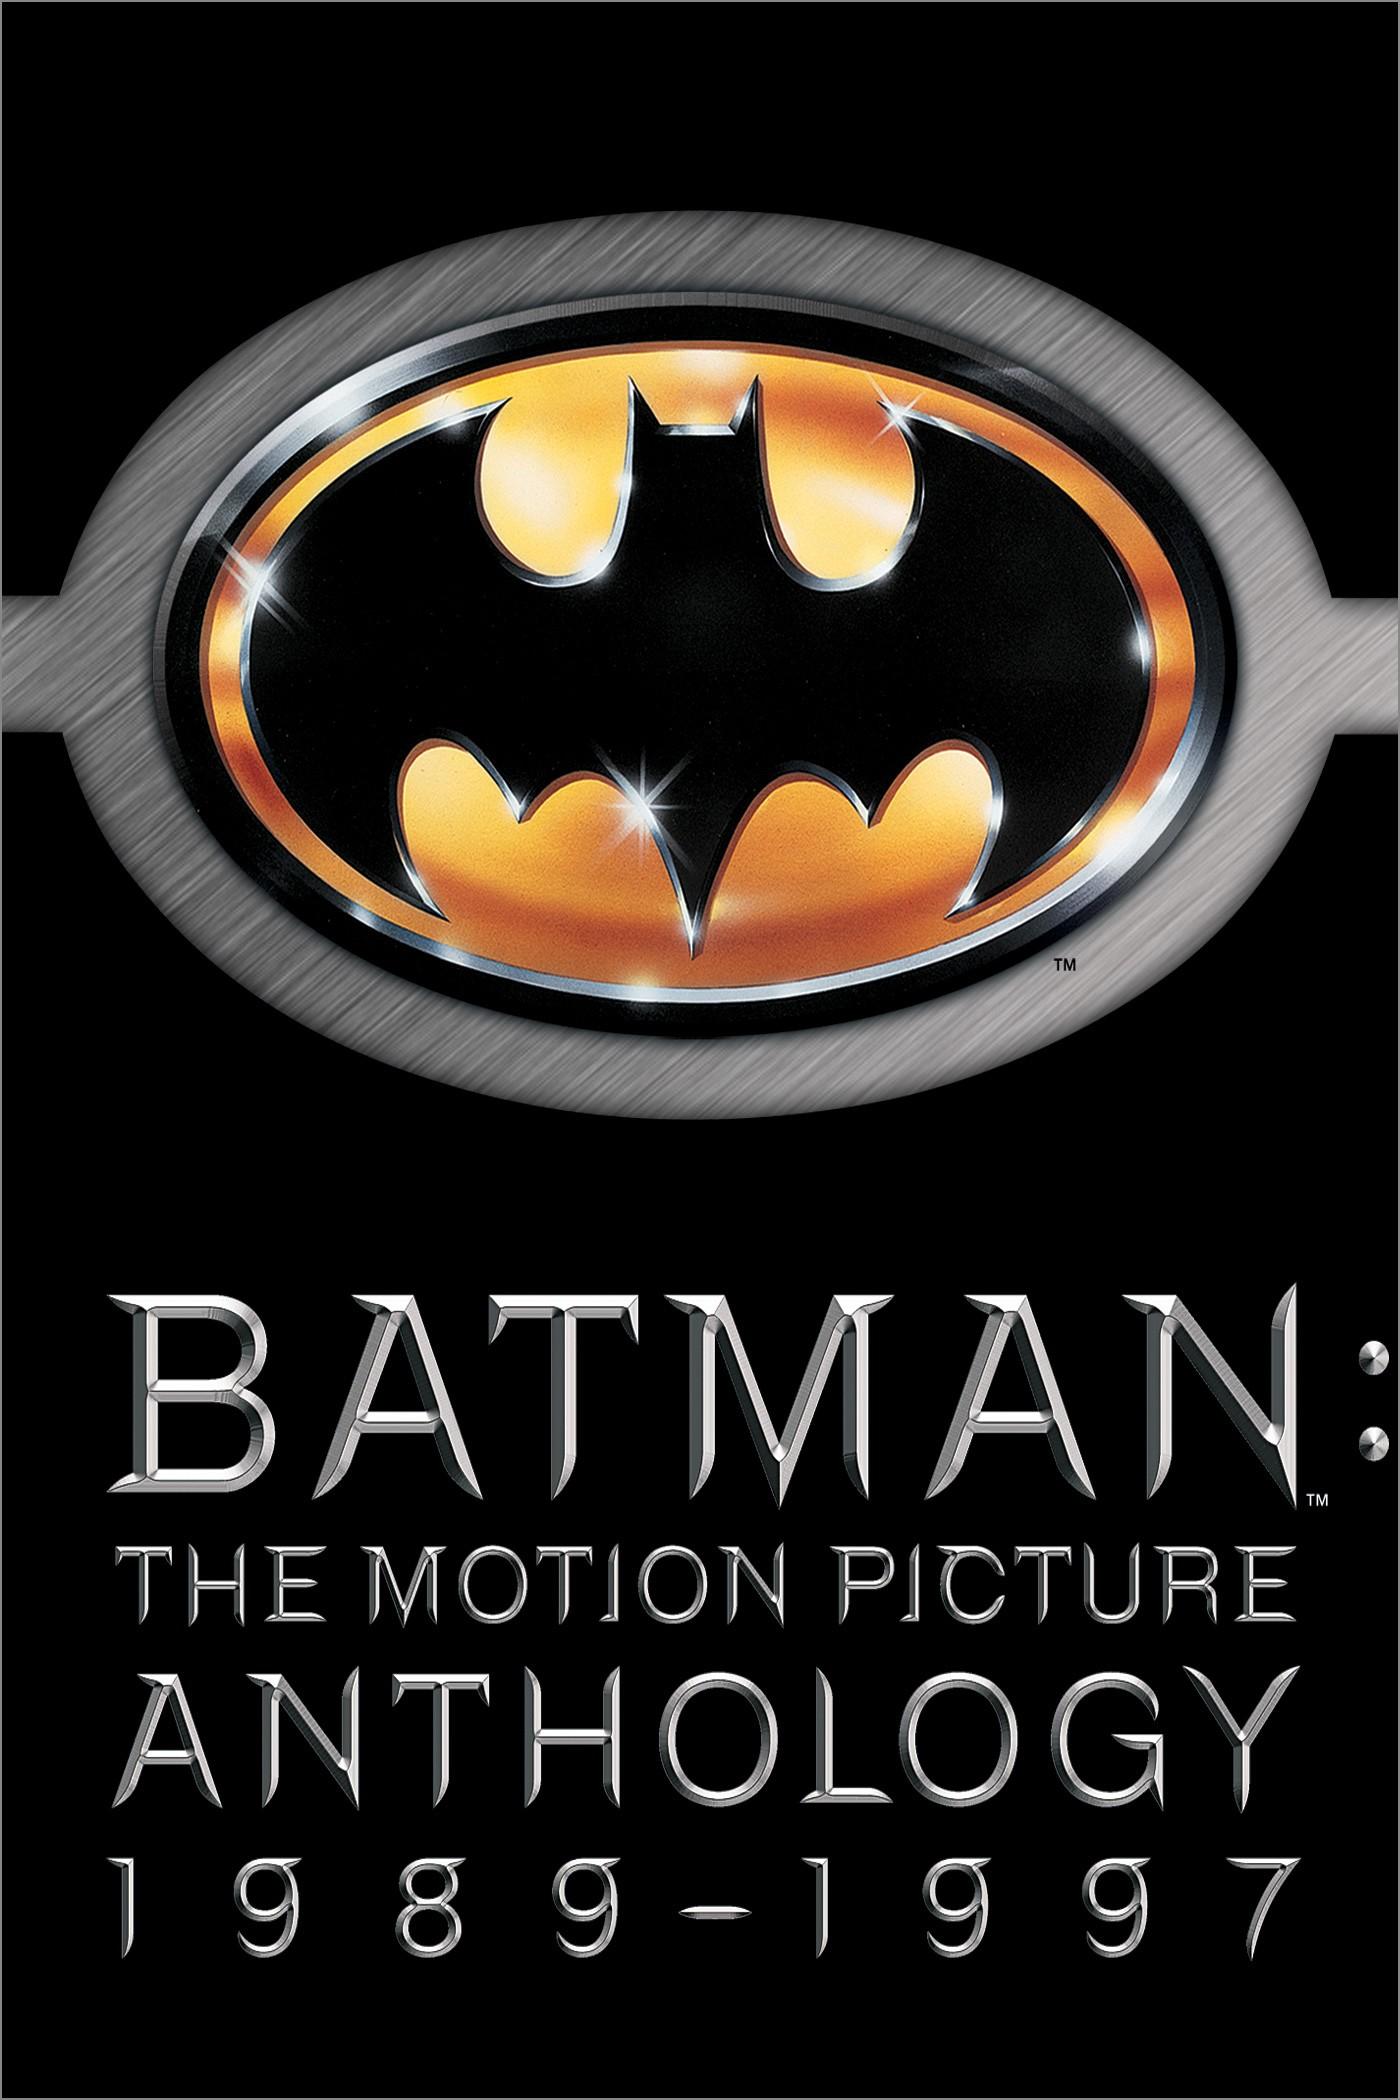 BATMAN : THE MOTION PICTURE ANTHOLOGY